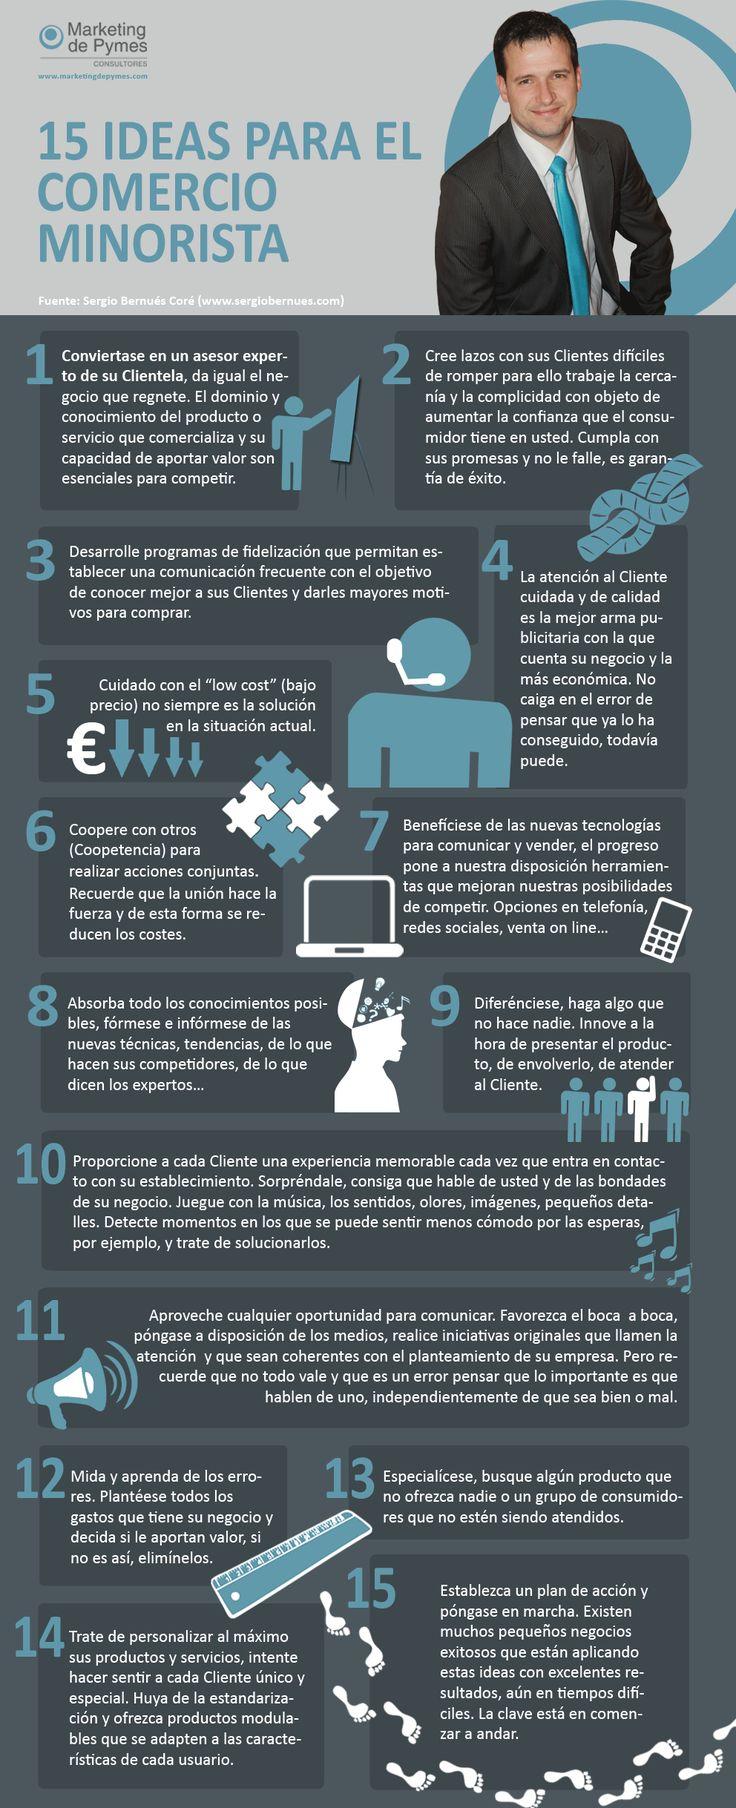 15 ideas para el comercio minorista #infografia #infographic #marketing